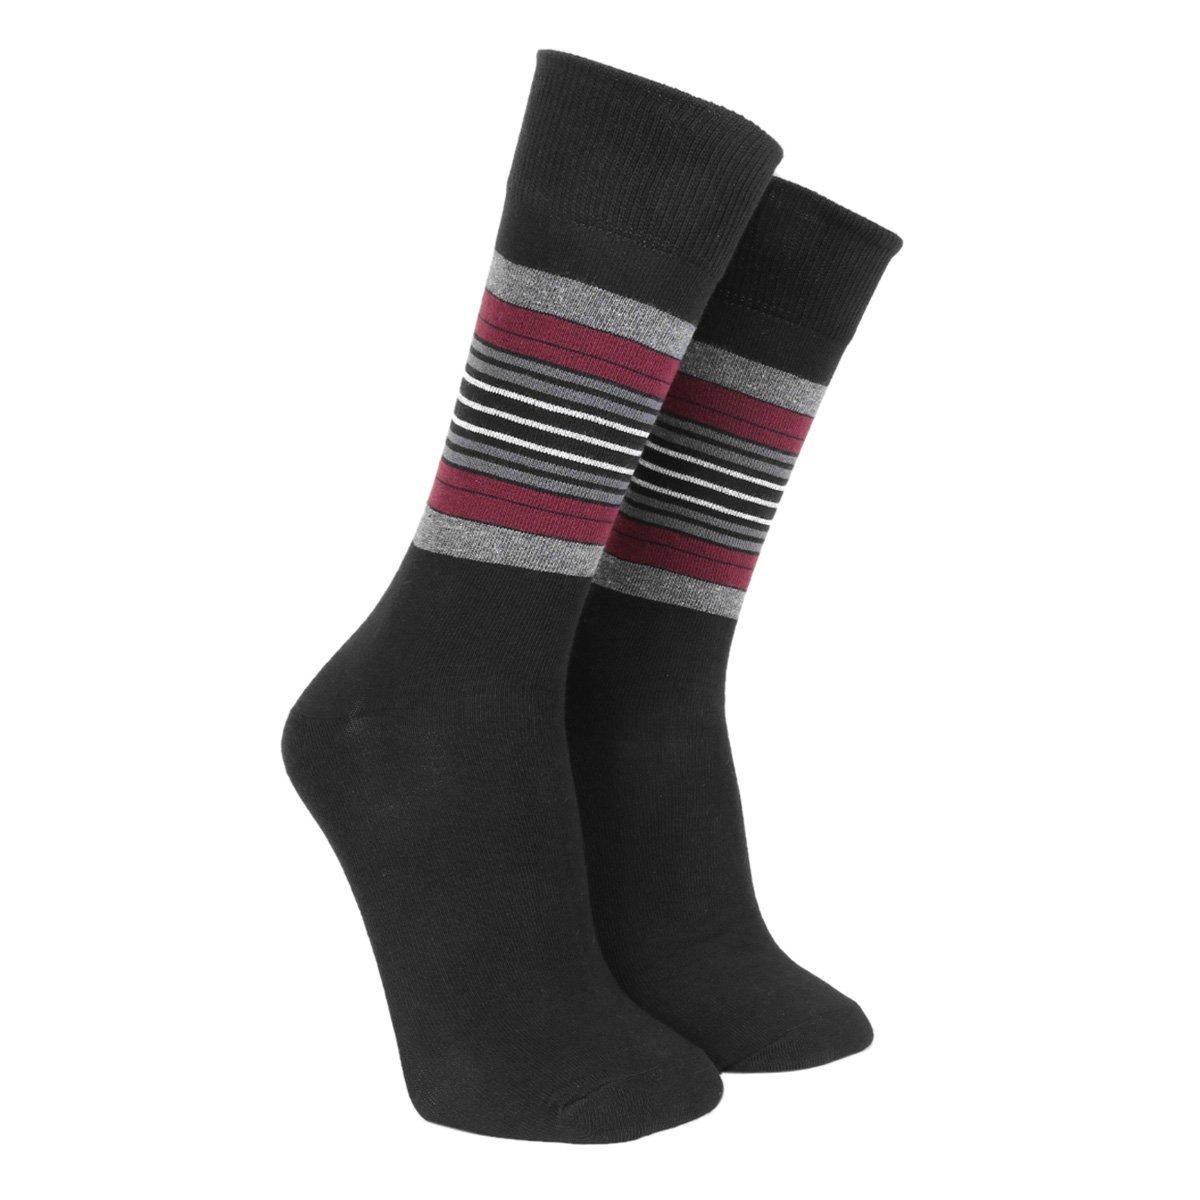 Meia Social Shoestock Sportwear Listras Masculina